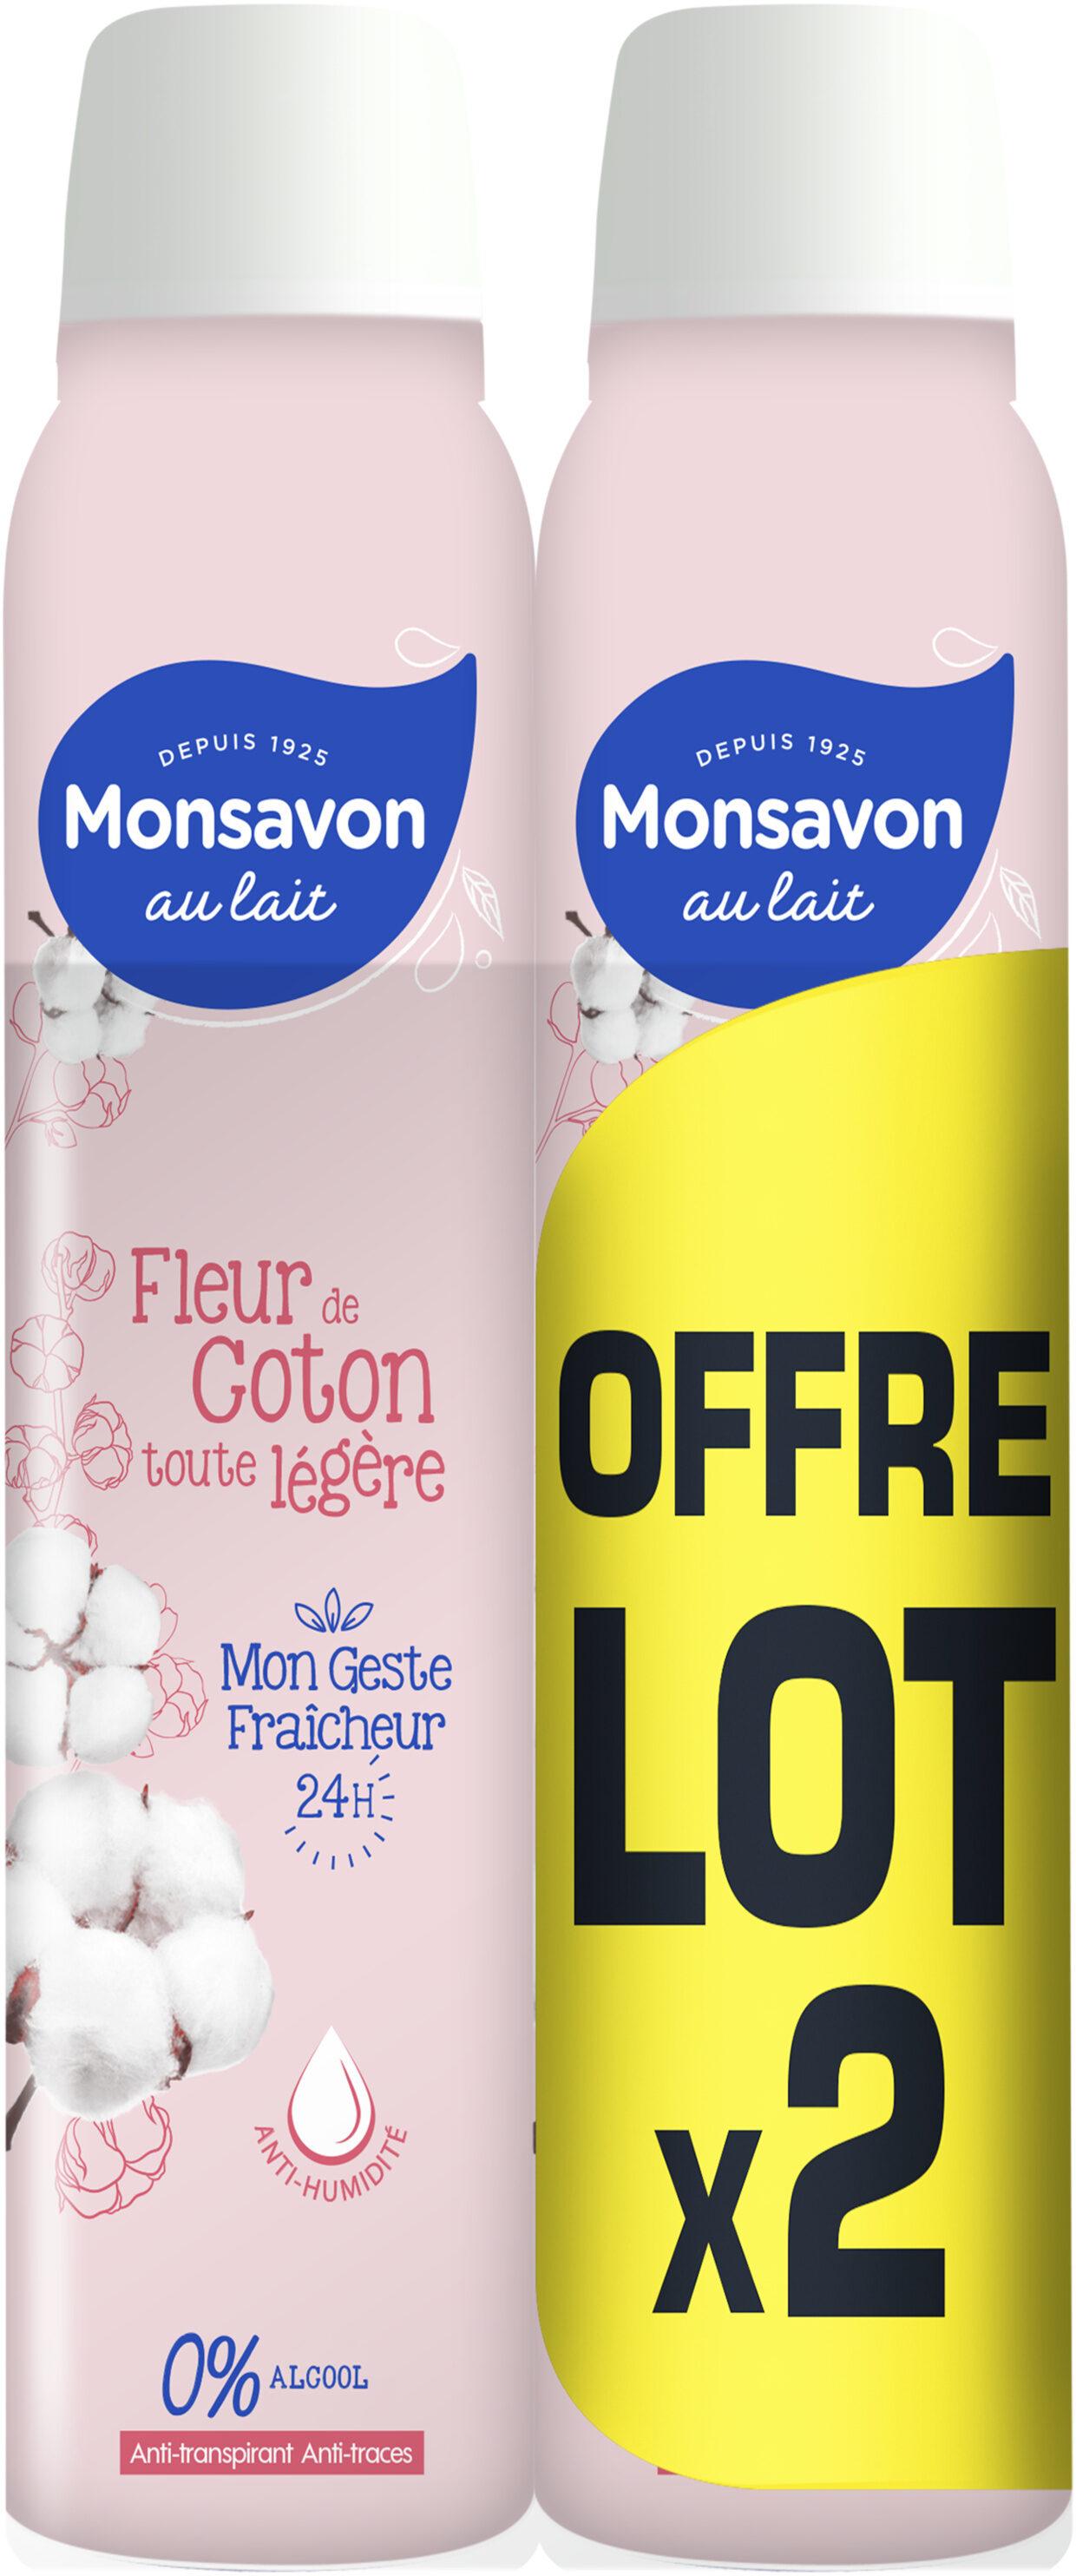 Monsavon Déodorant Femme Spray Anti Transpirant Lait & Coton 2x200ml - Product - fr